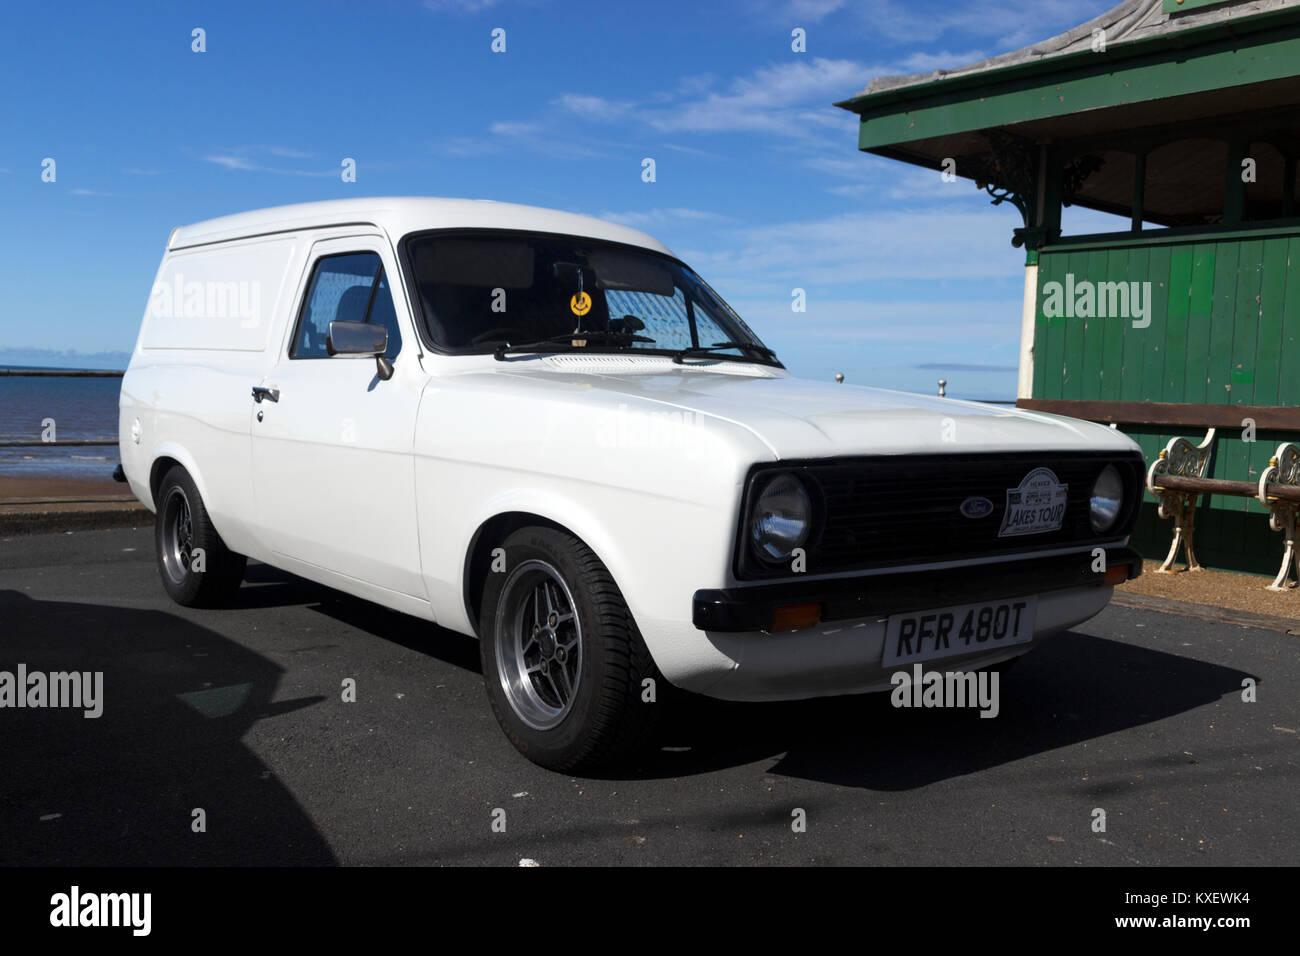 47949818eb Ford Escort Van Stock Photos   Ford Escort Van Stock Images - Alamy